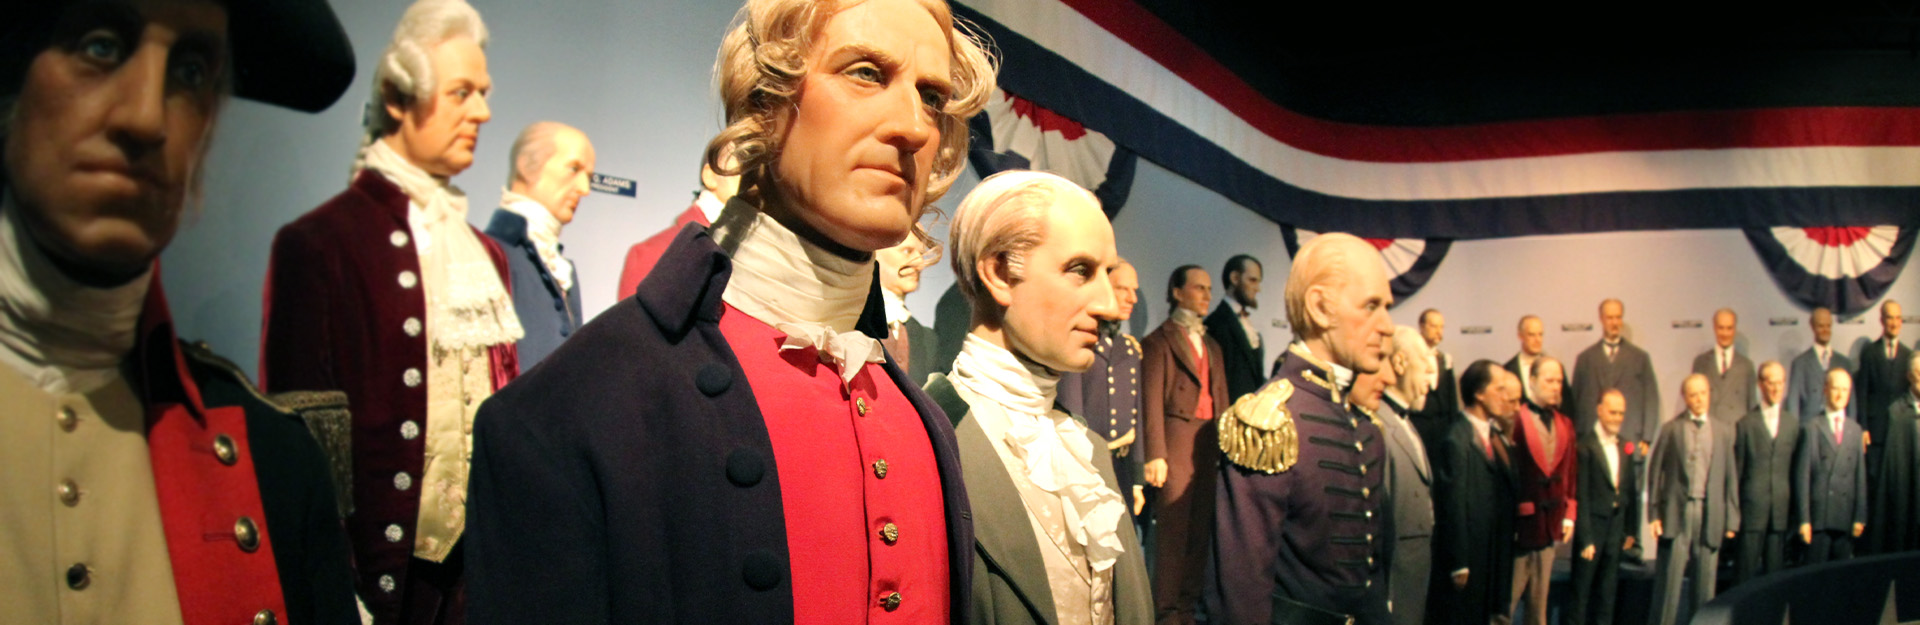 Presidential Gallery